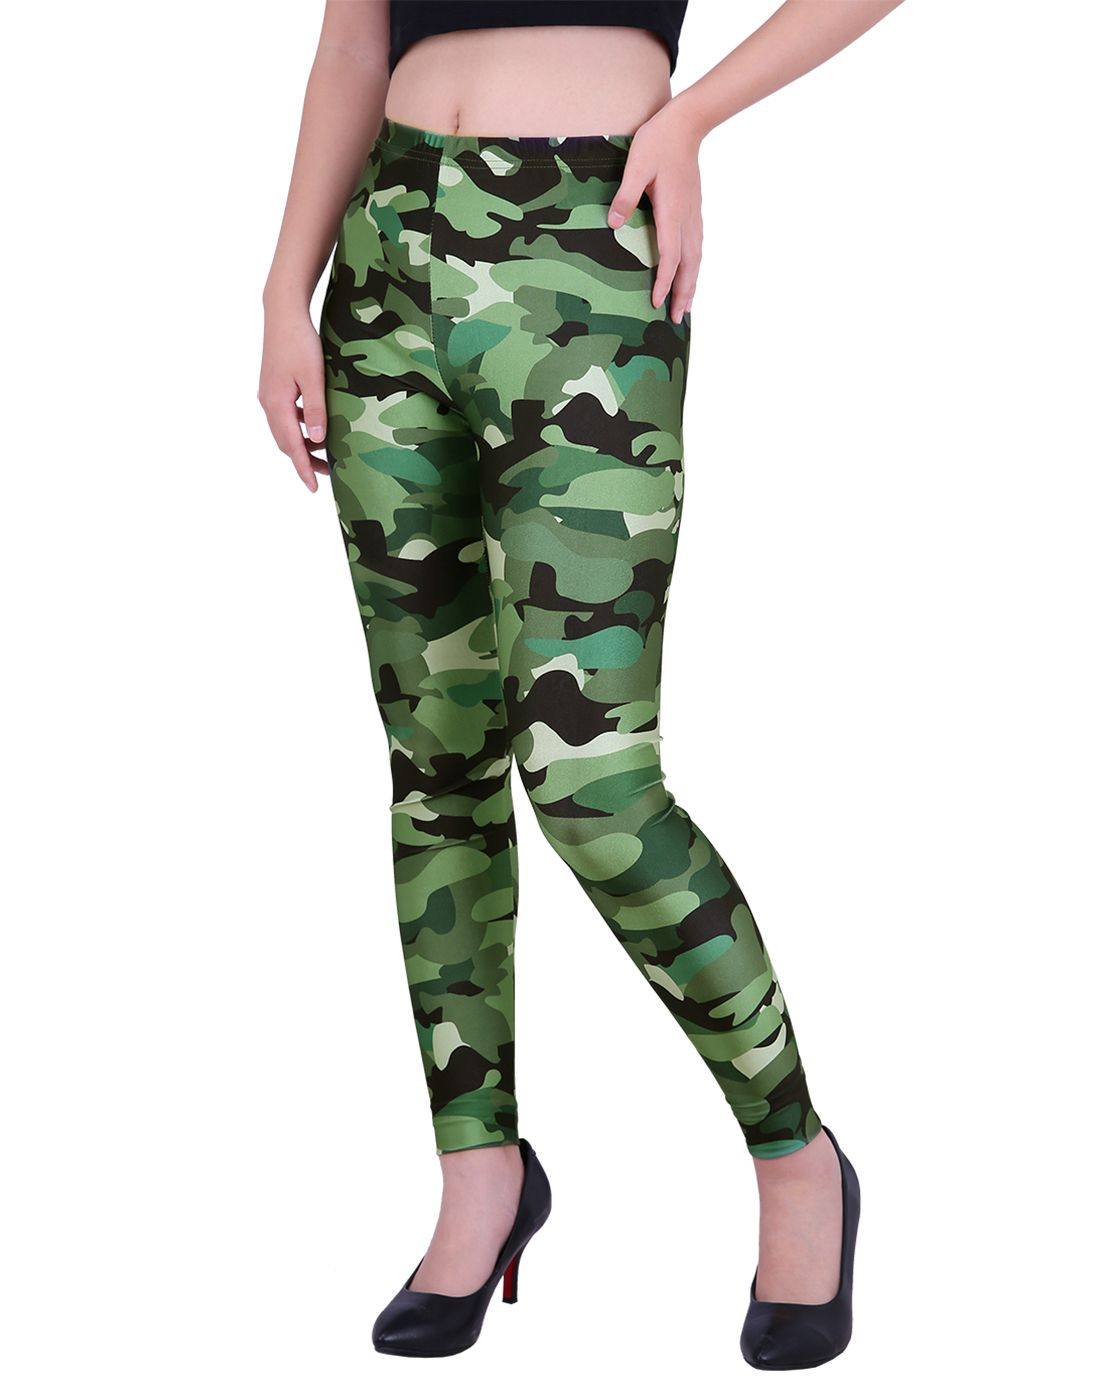 ac1ad9a4ab04f HDE Women's Leggings Graphic Print Tights Fun Digital Design Holiday  Elastic Pants (Halloween Theme,